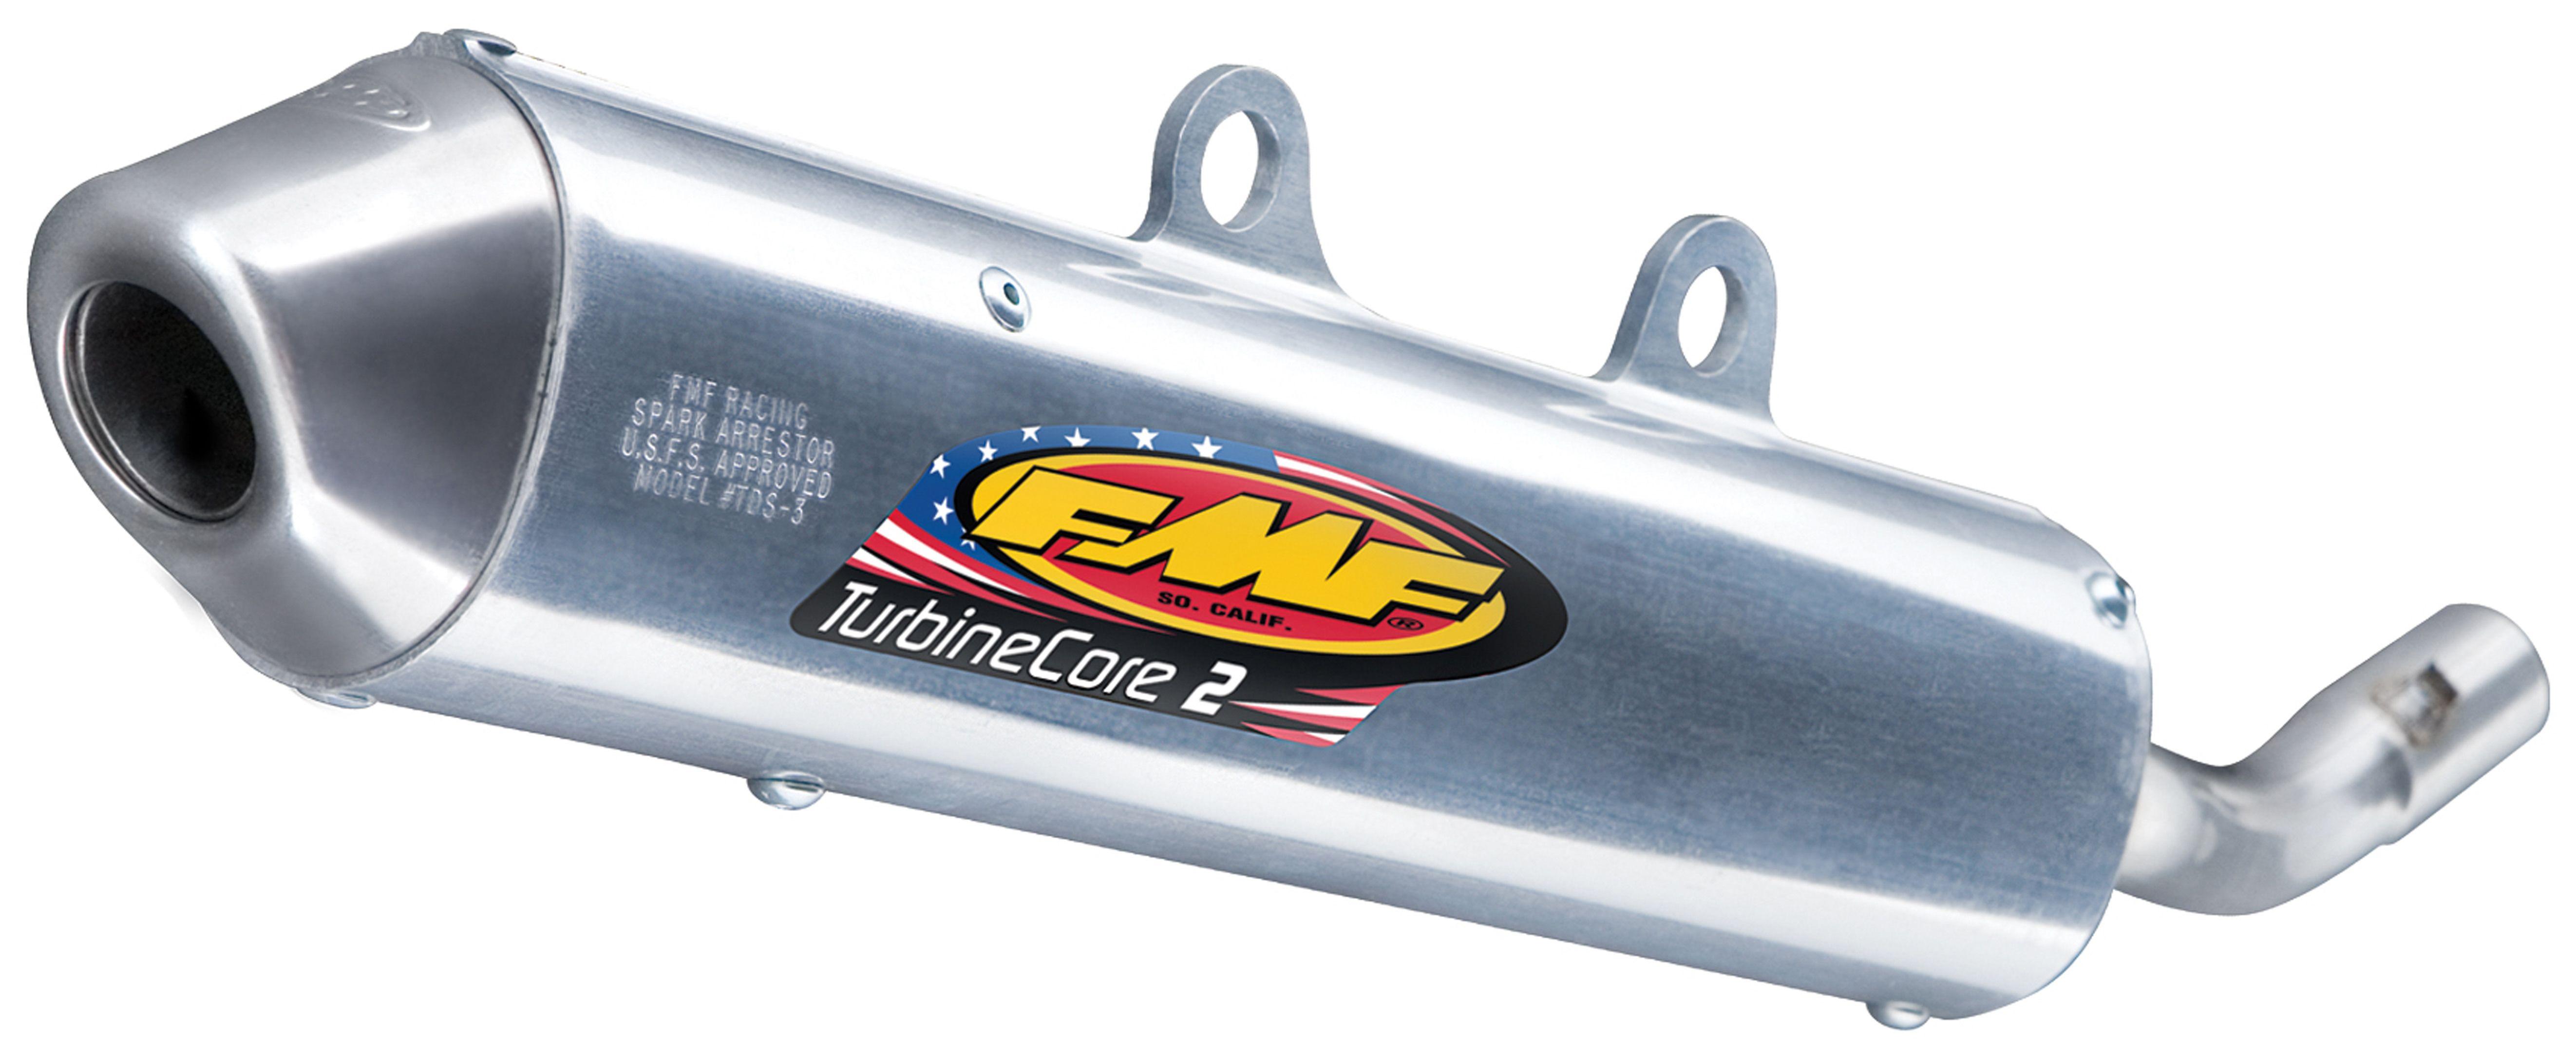 FMF Turbinecore 2 Silencer KTM 200 250 300 025027